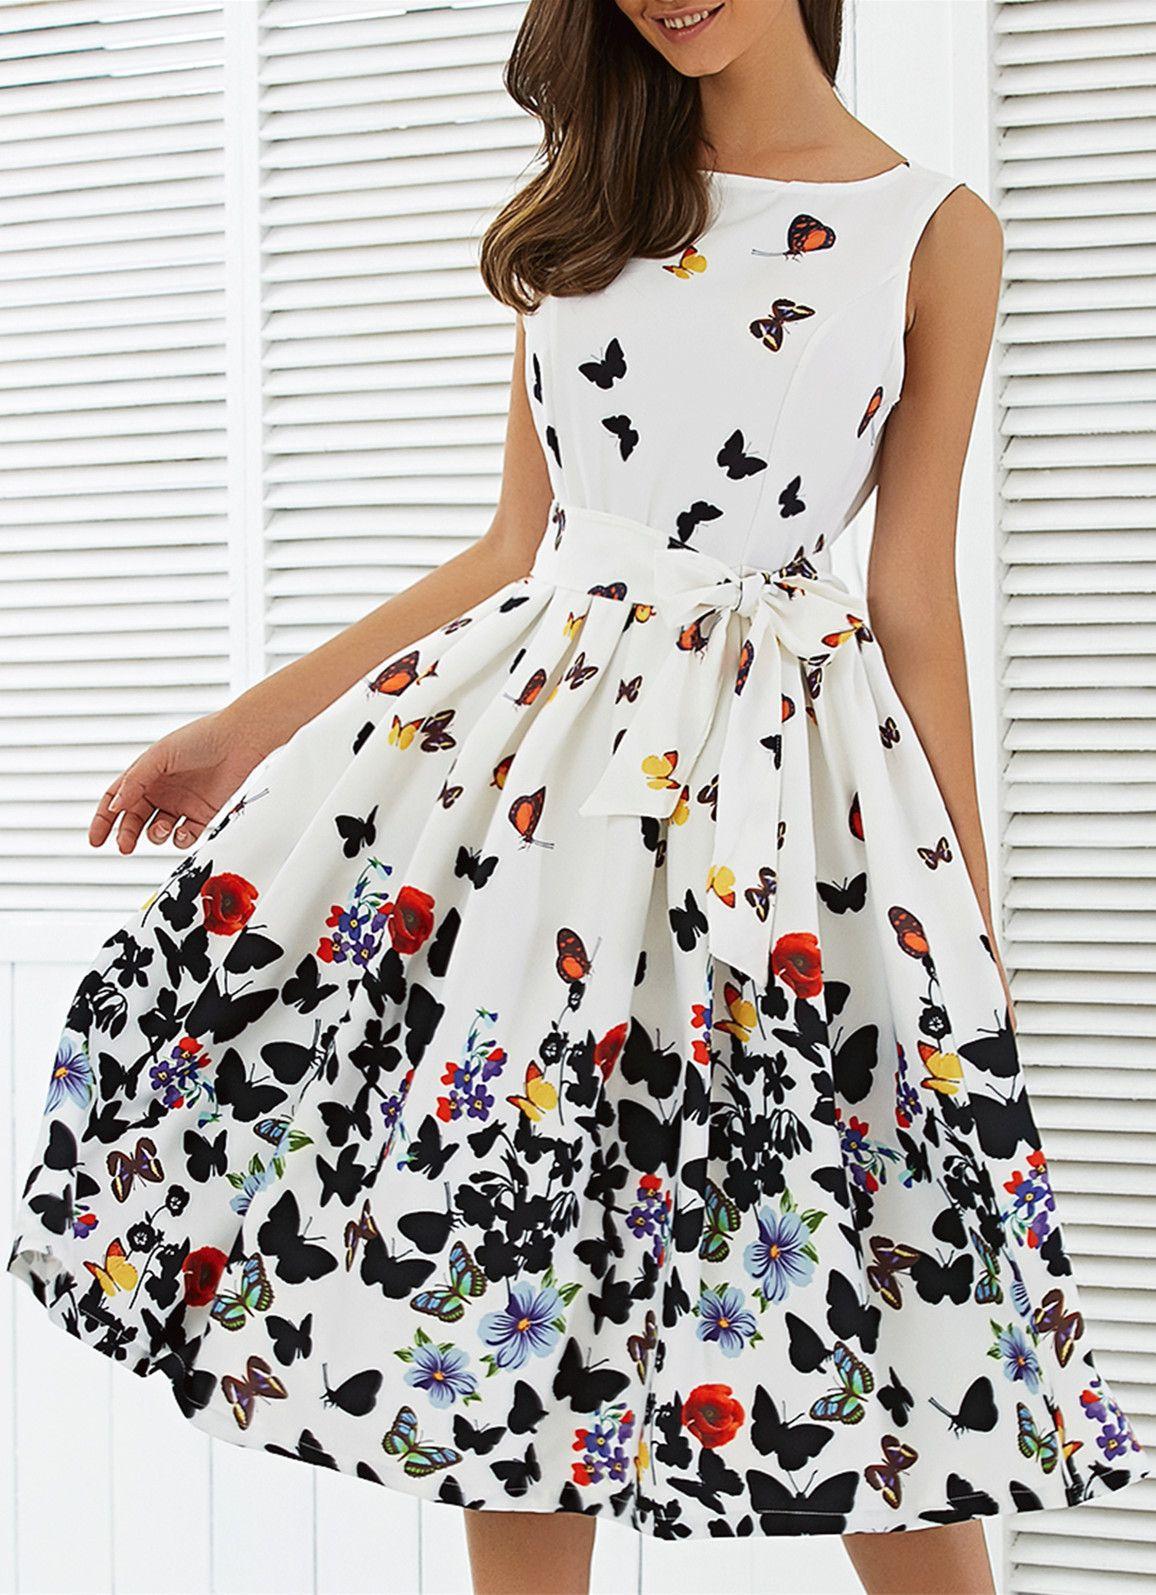 36efbc4301a Sleeveless Floral Print Self Tie A Line Dress - White - 2xl ...